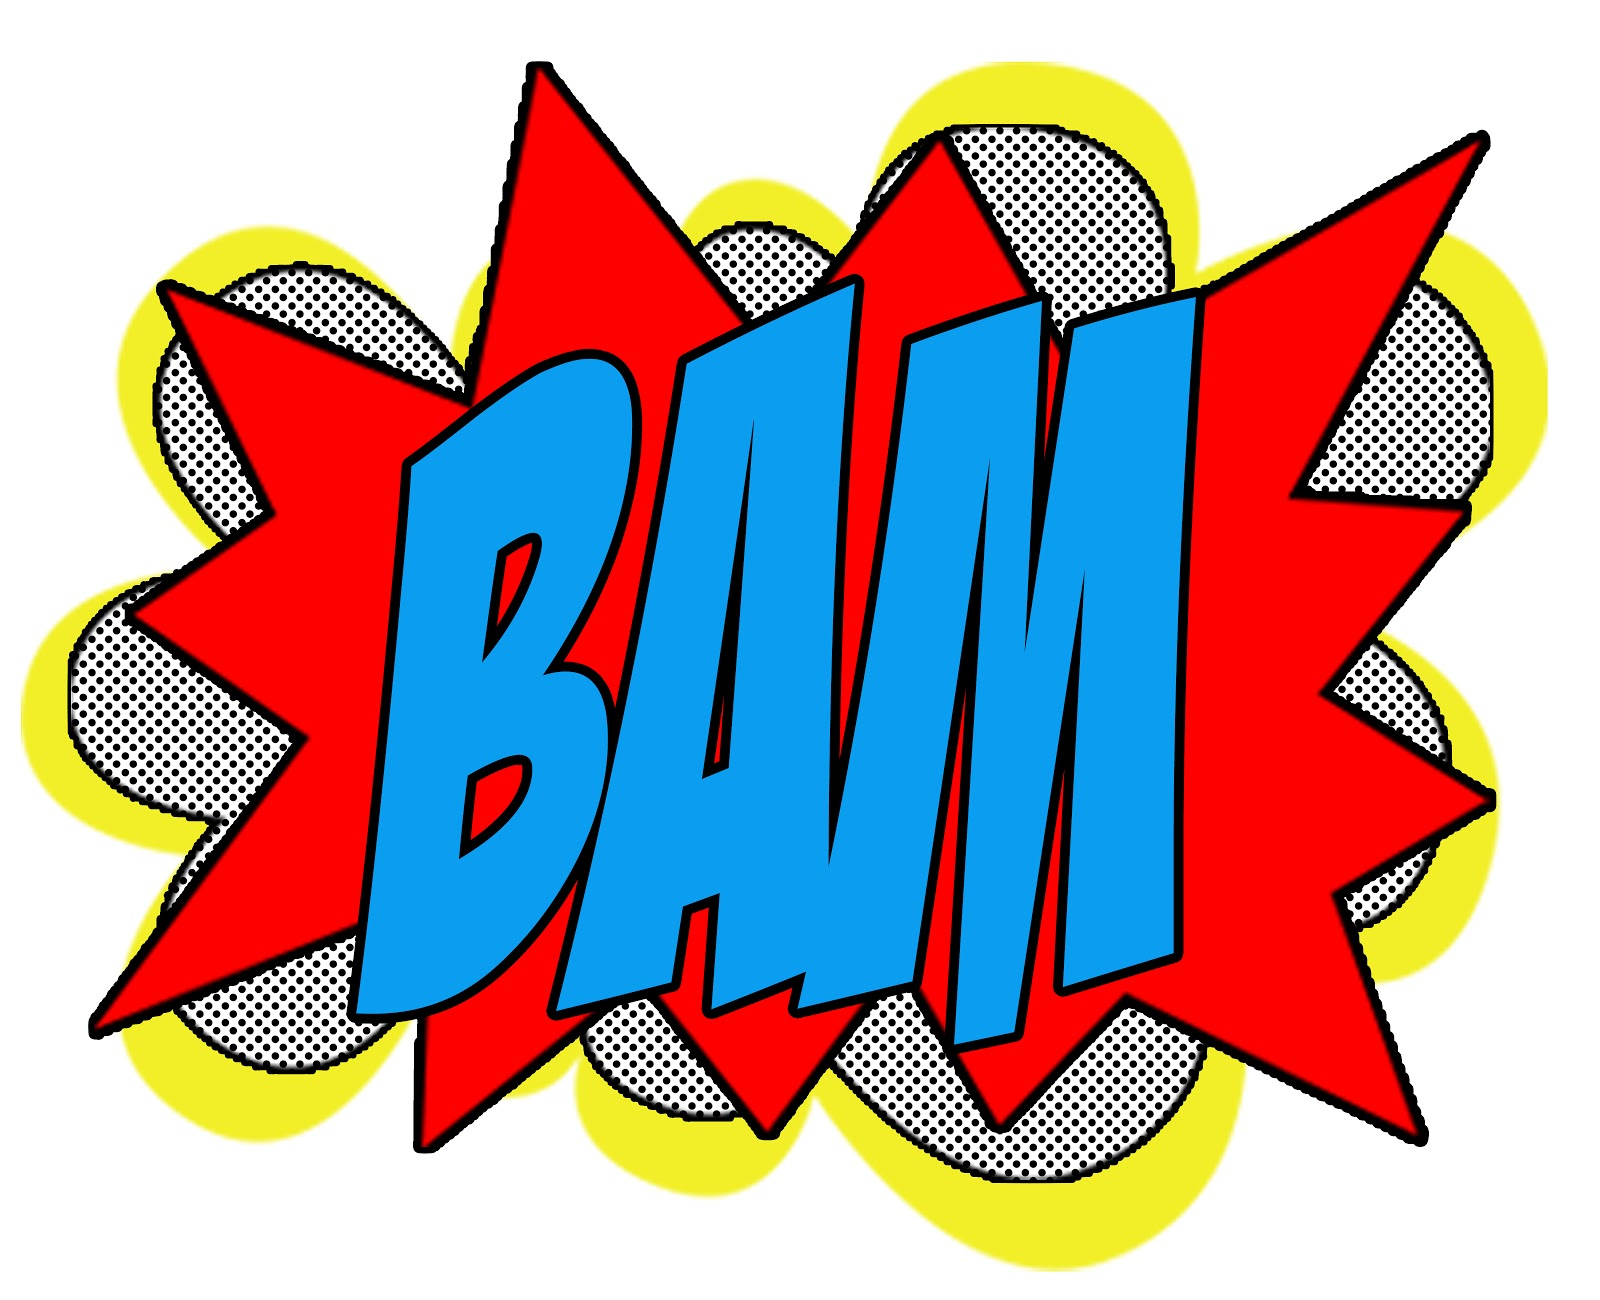 Superhero words superhero pow clipart-Superhero words superhero pow clipart-11